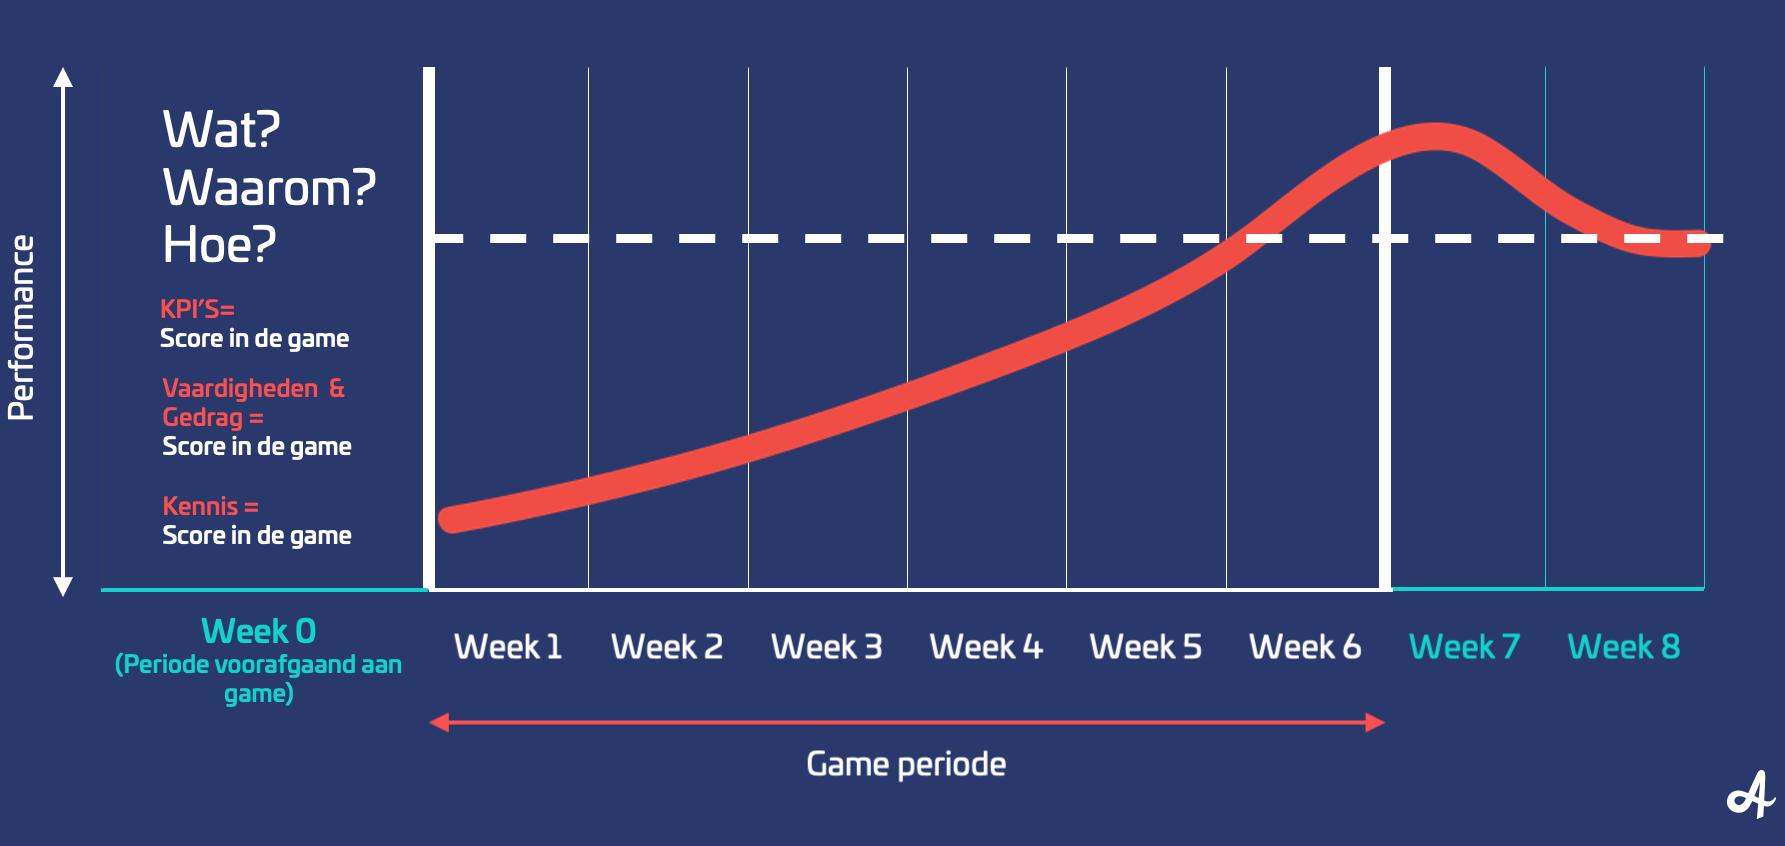 game-periode